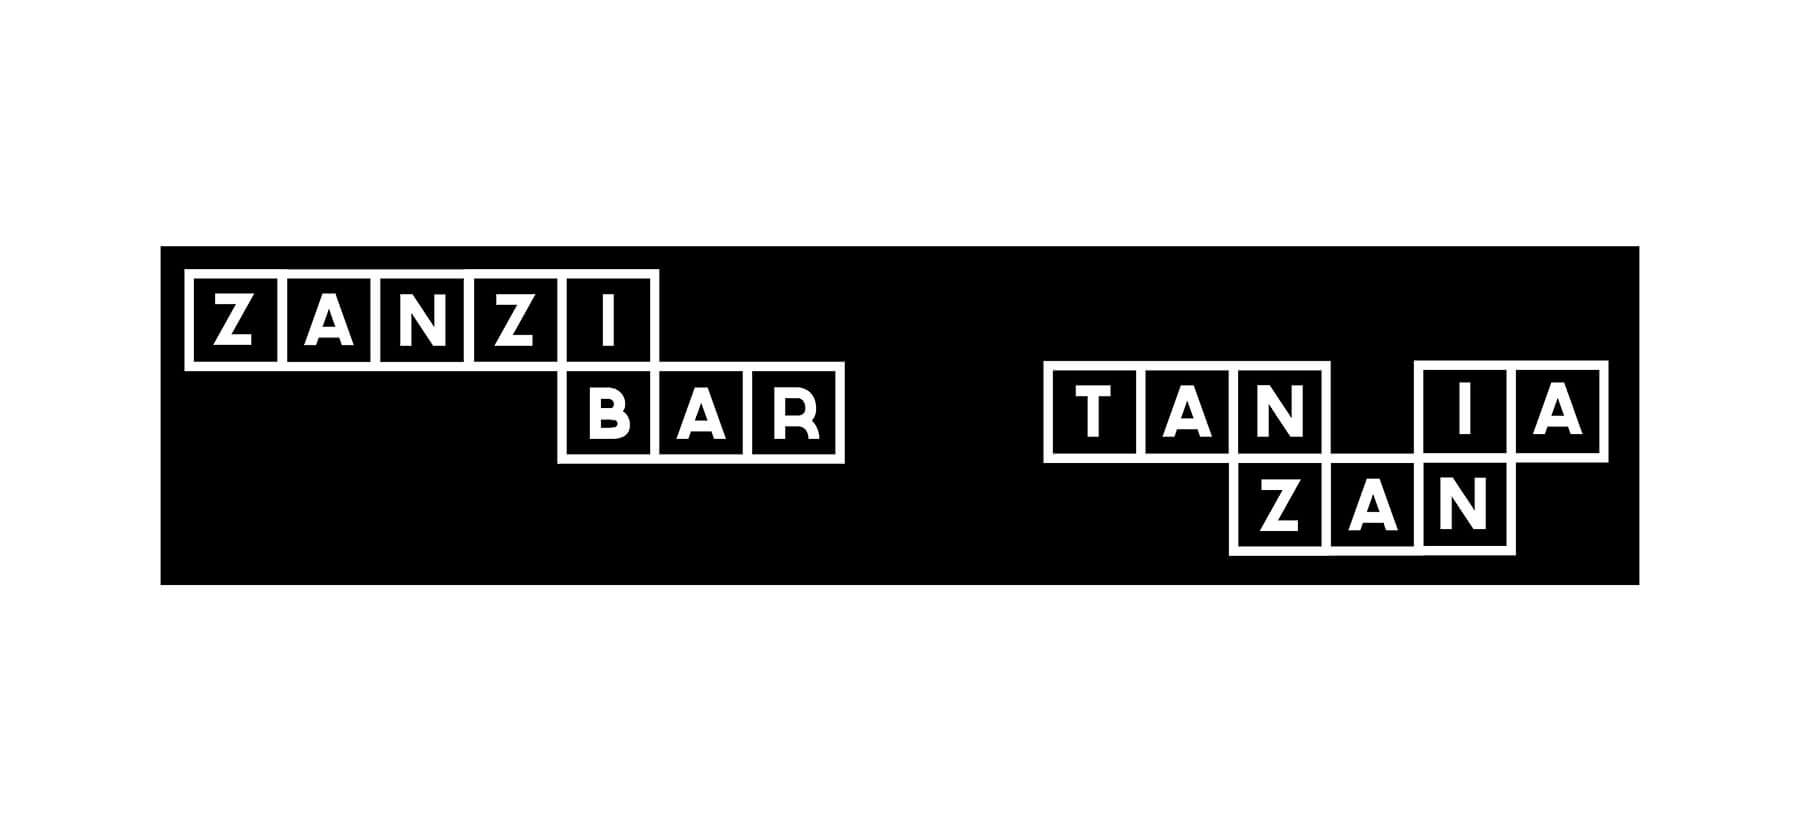 riette-error-dentsu-aegis-network-office-signage-branding-signs-zanzibar-tanzania-09